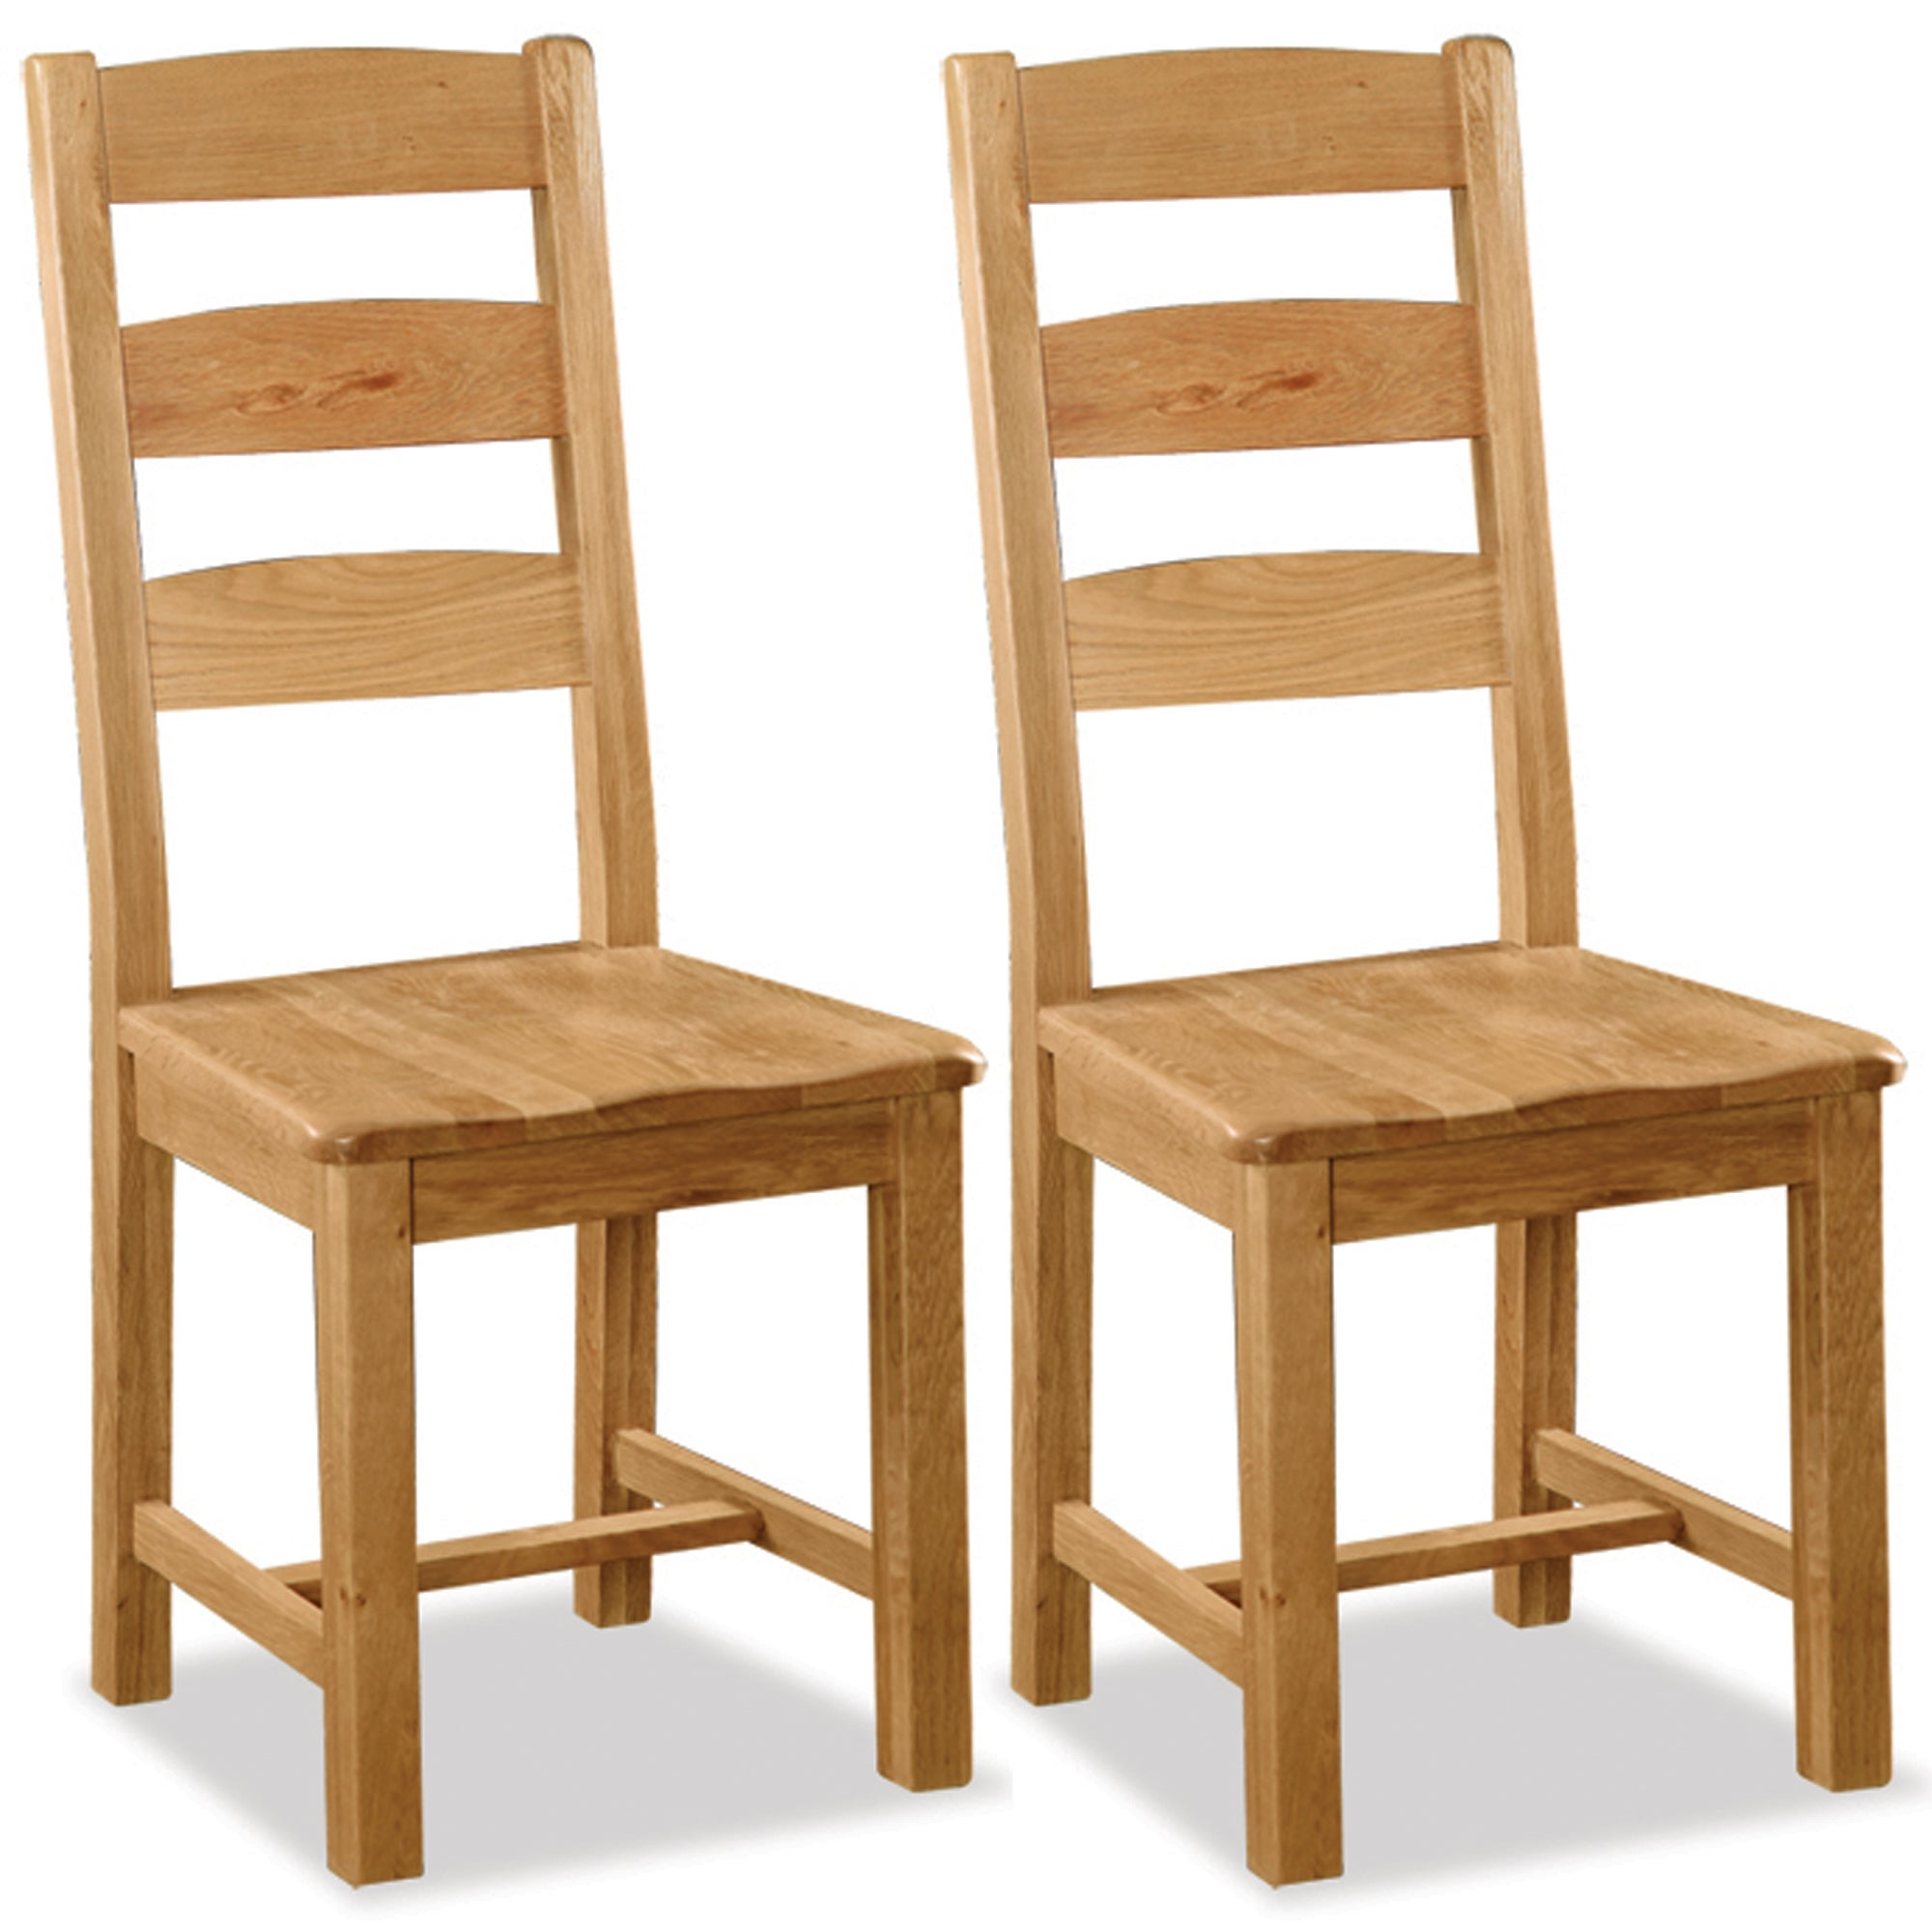 Aylesbury Pair of Oak Slatted Back Dining Chairs